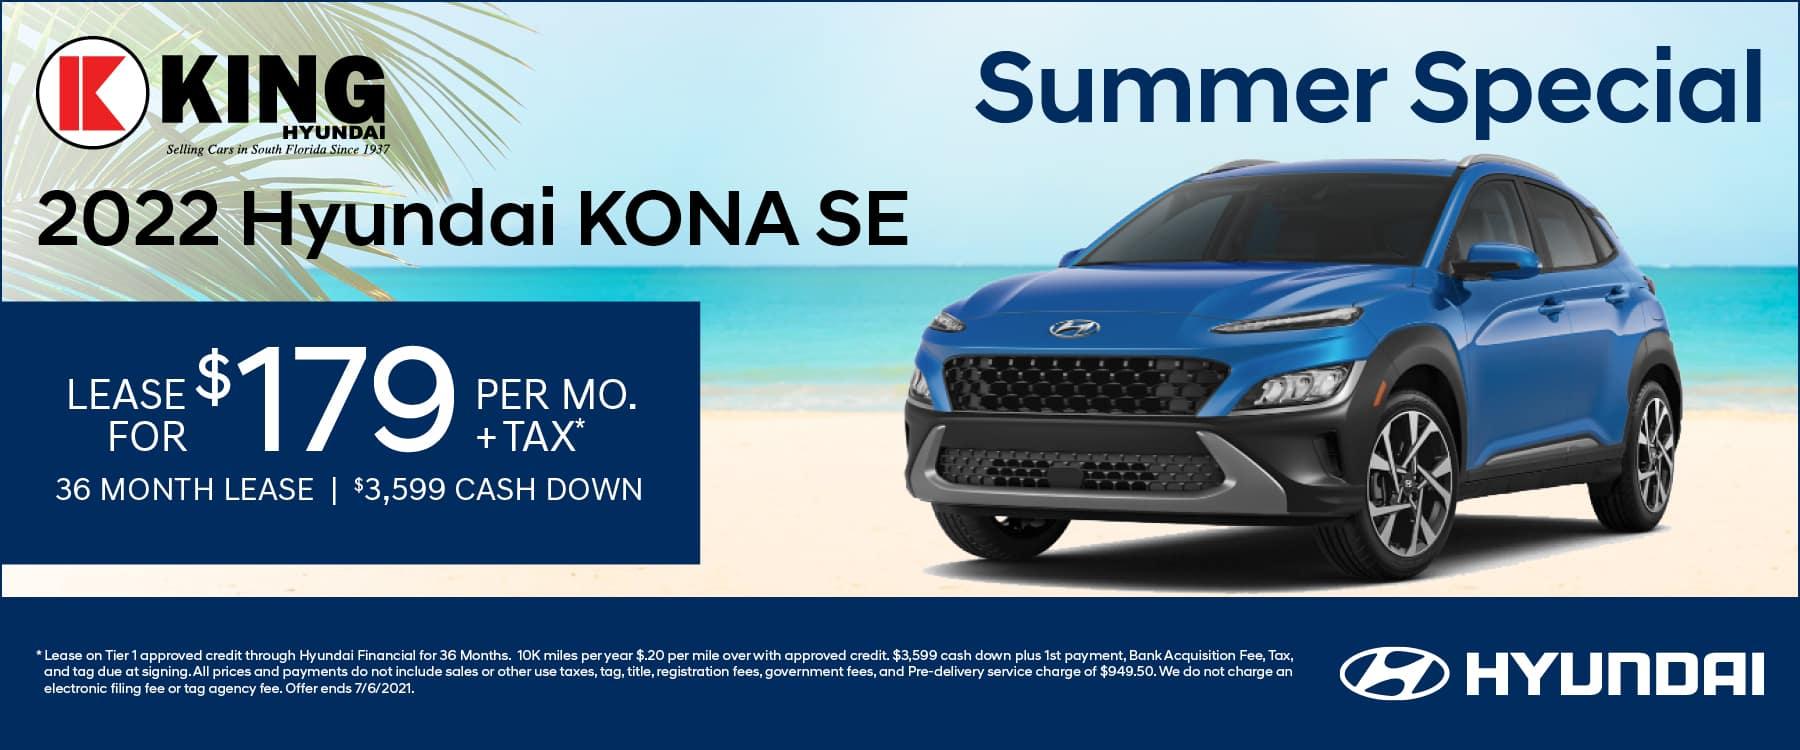 KNH-213253 King Hyundai June Lease 1800×750 Kona SE